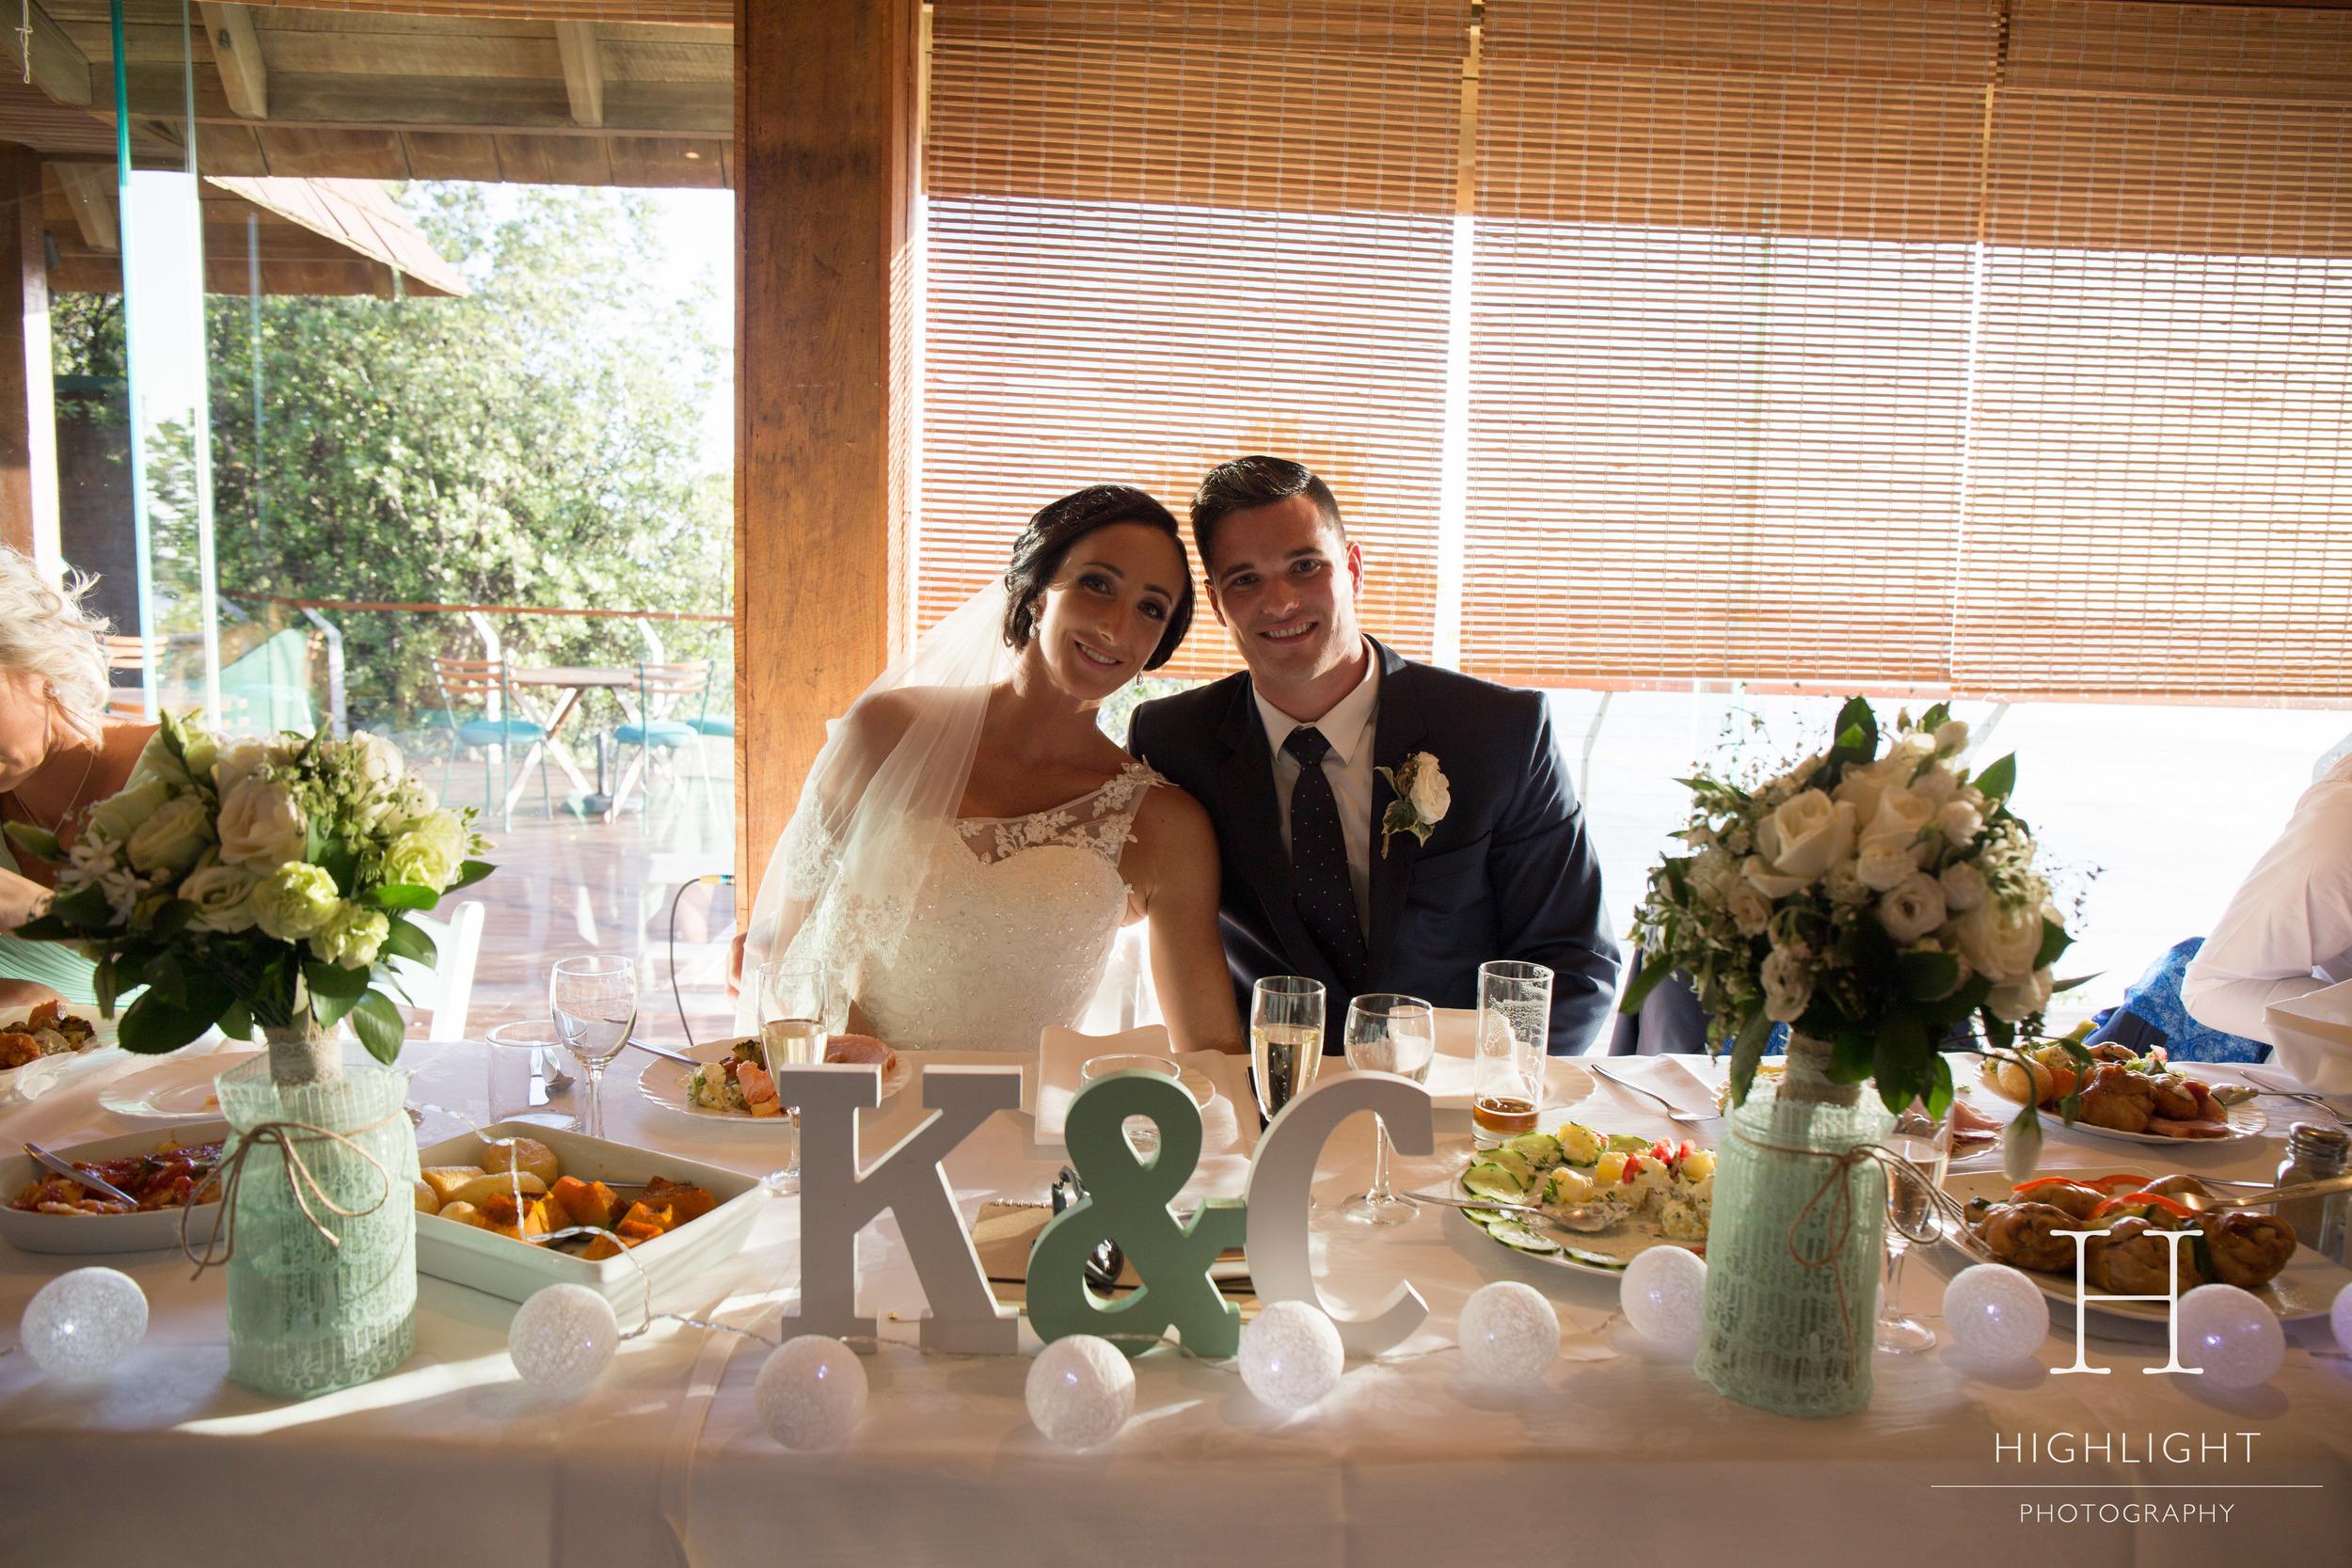 highlight_photography_wedding_new_zealand_reception.jpg